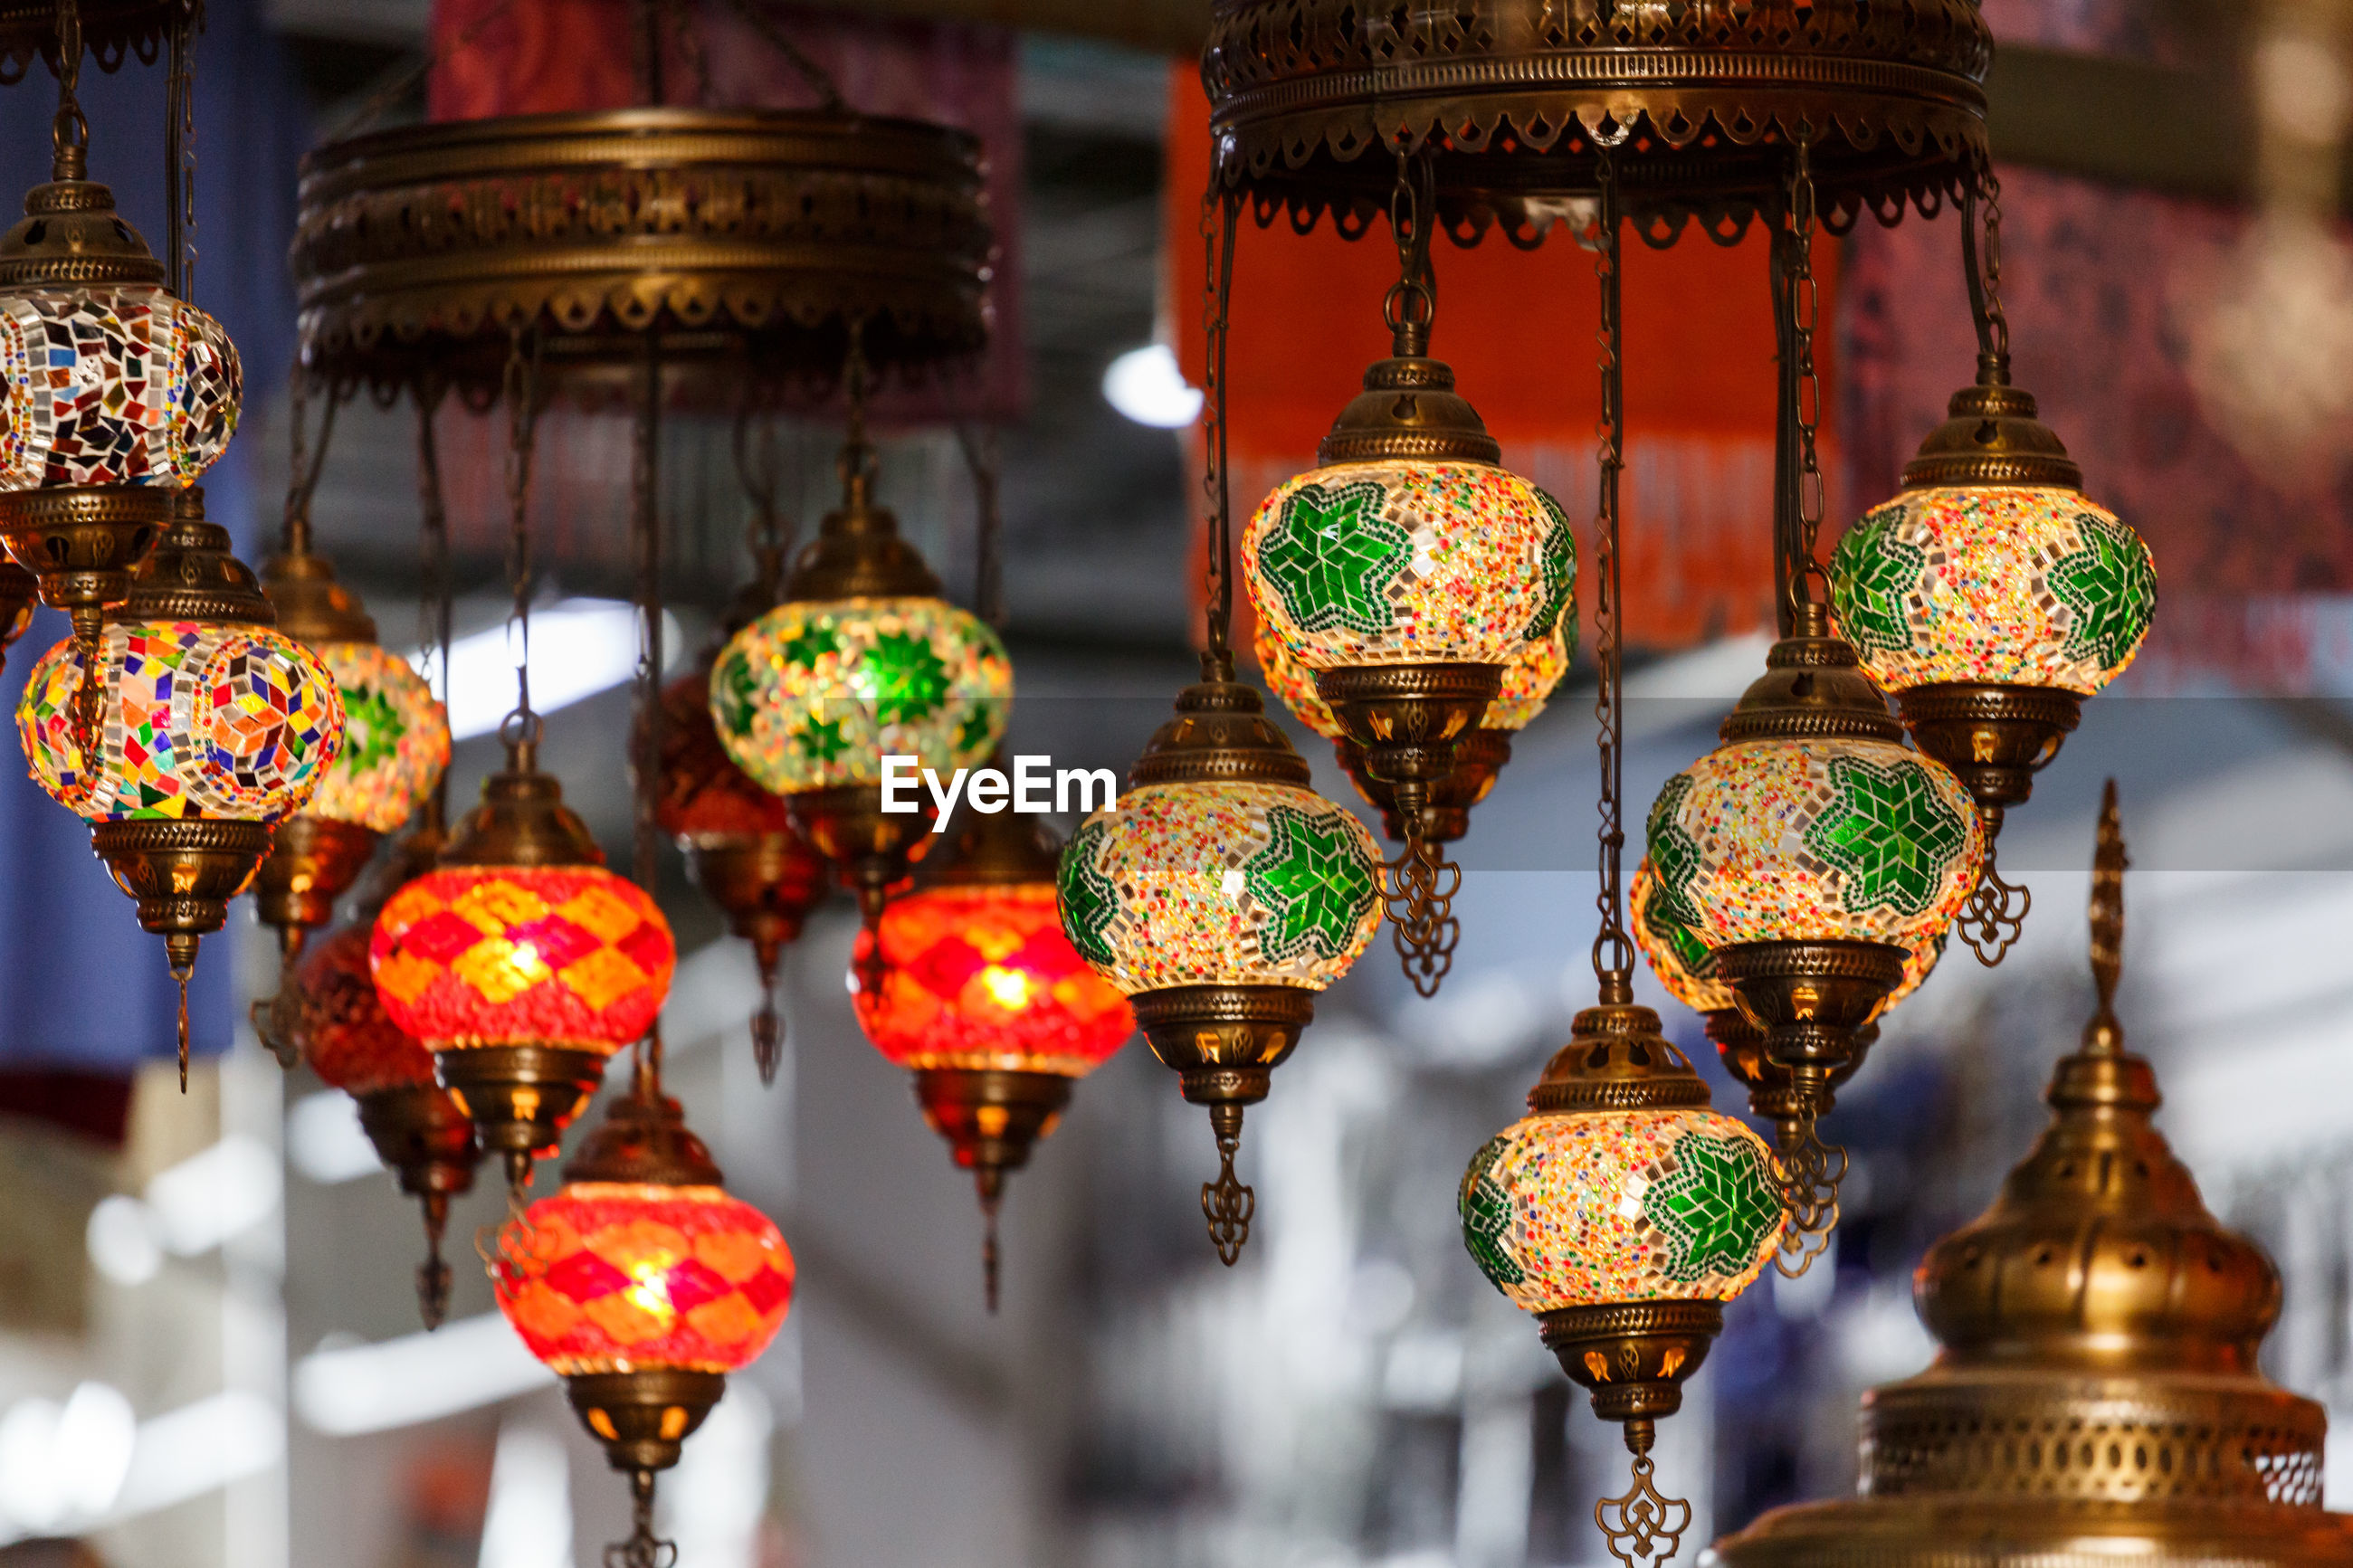 Illuminated lanterns hanging in row